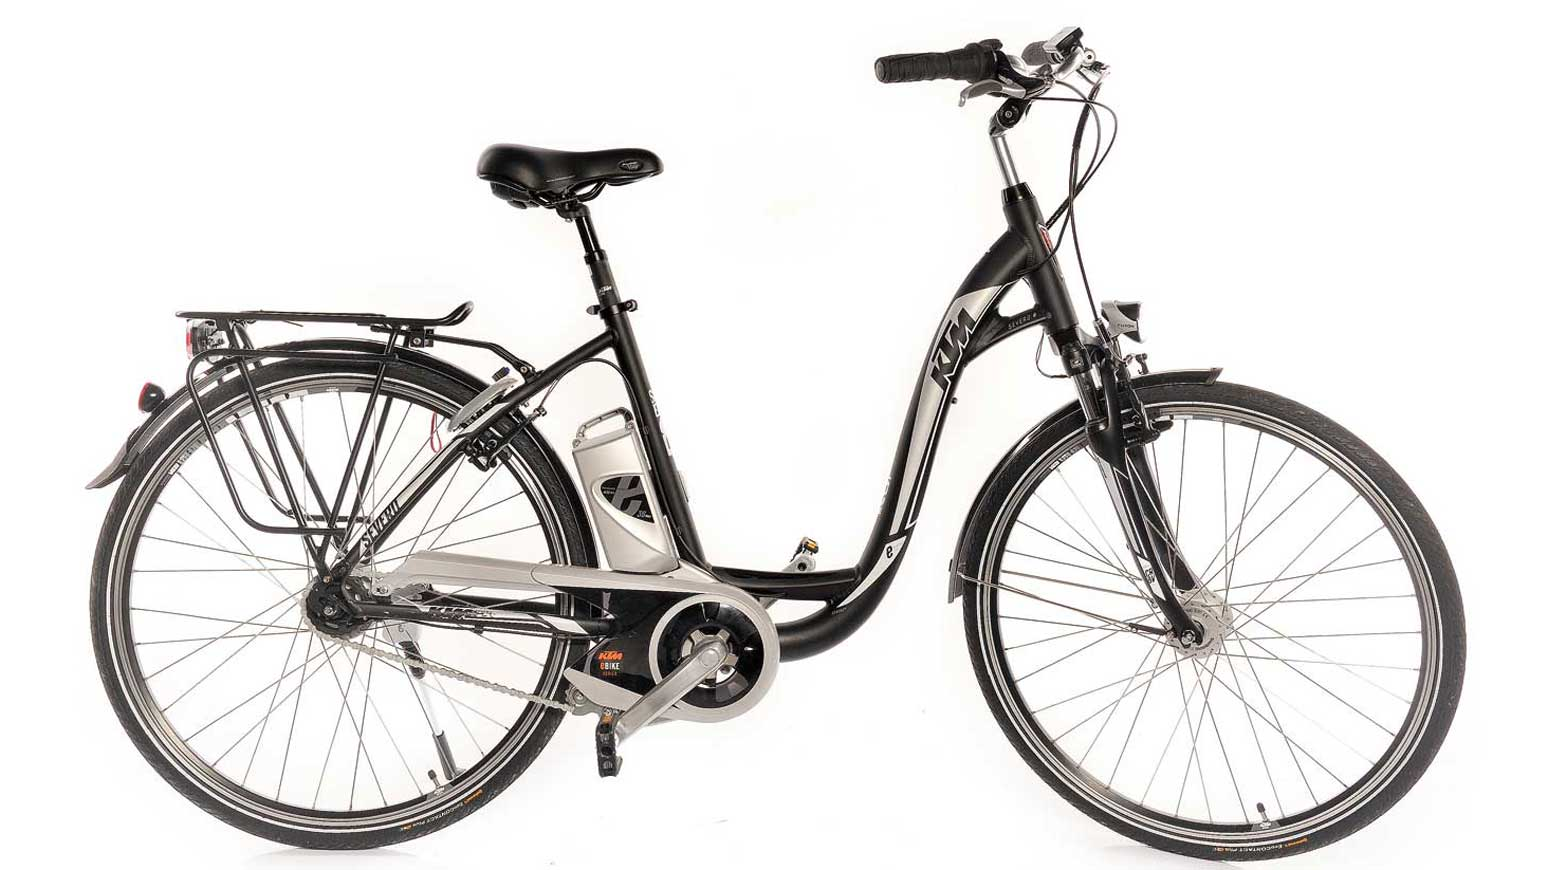 Test KTM Severo 8-RT: Stadt-E-Bike aus dem Modelljahr 2012